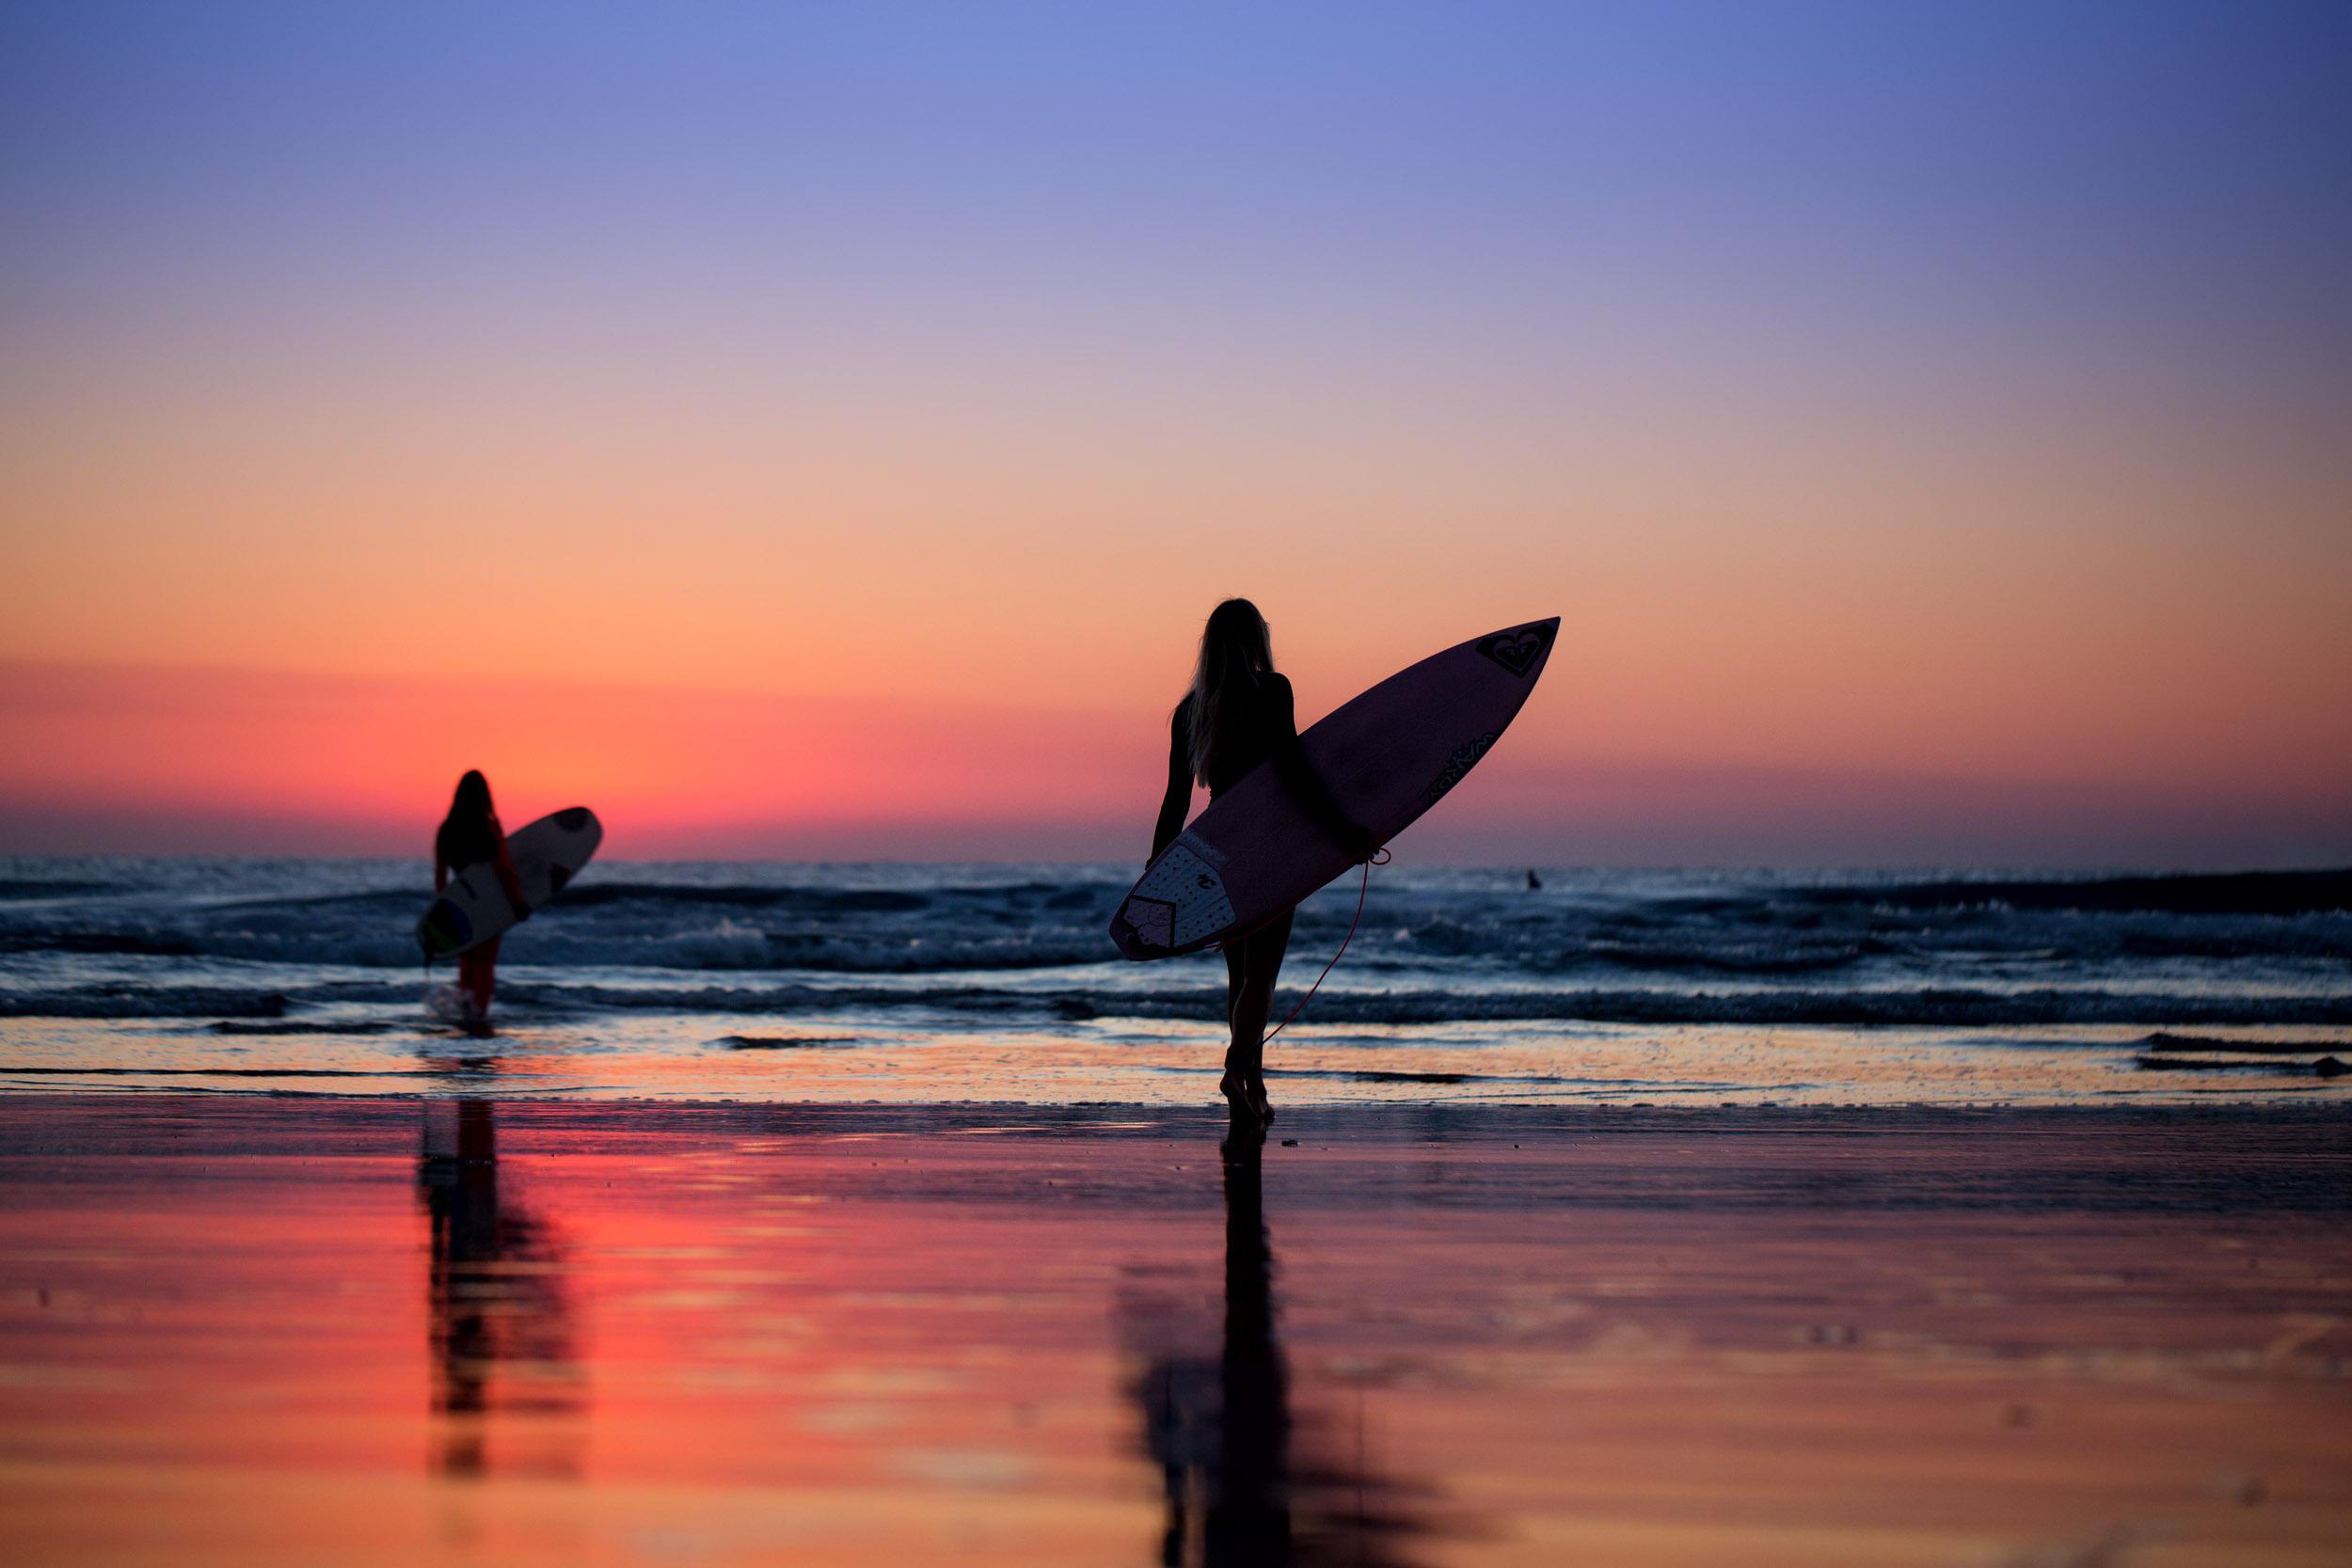 sunrise-surfing-coolum-beach.jpg